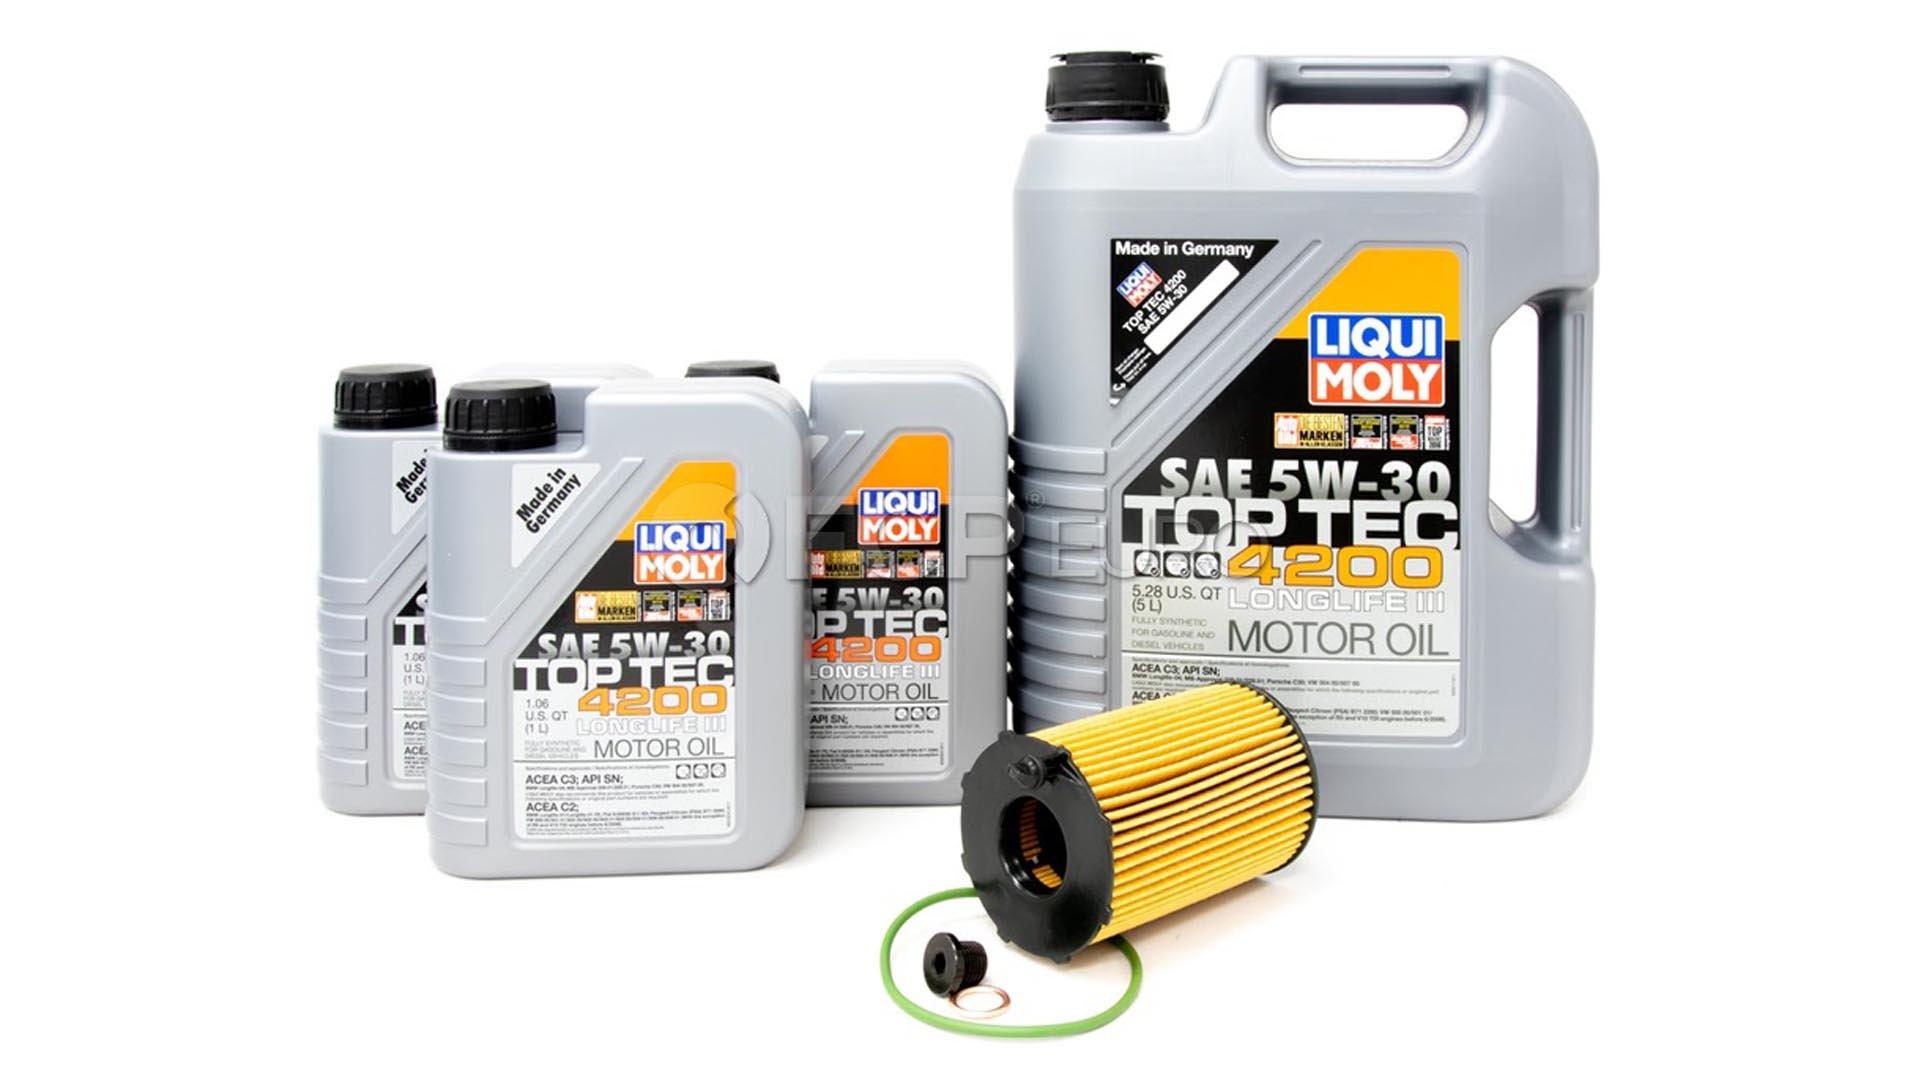 Porsche Cayenne LIQUI MOLY oil